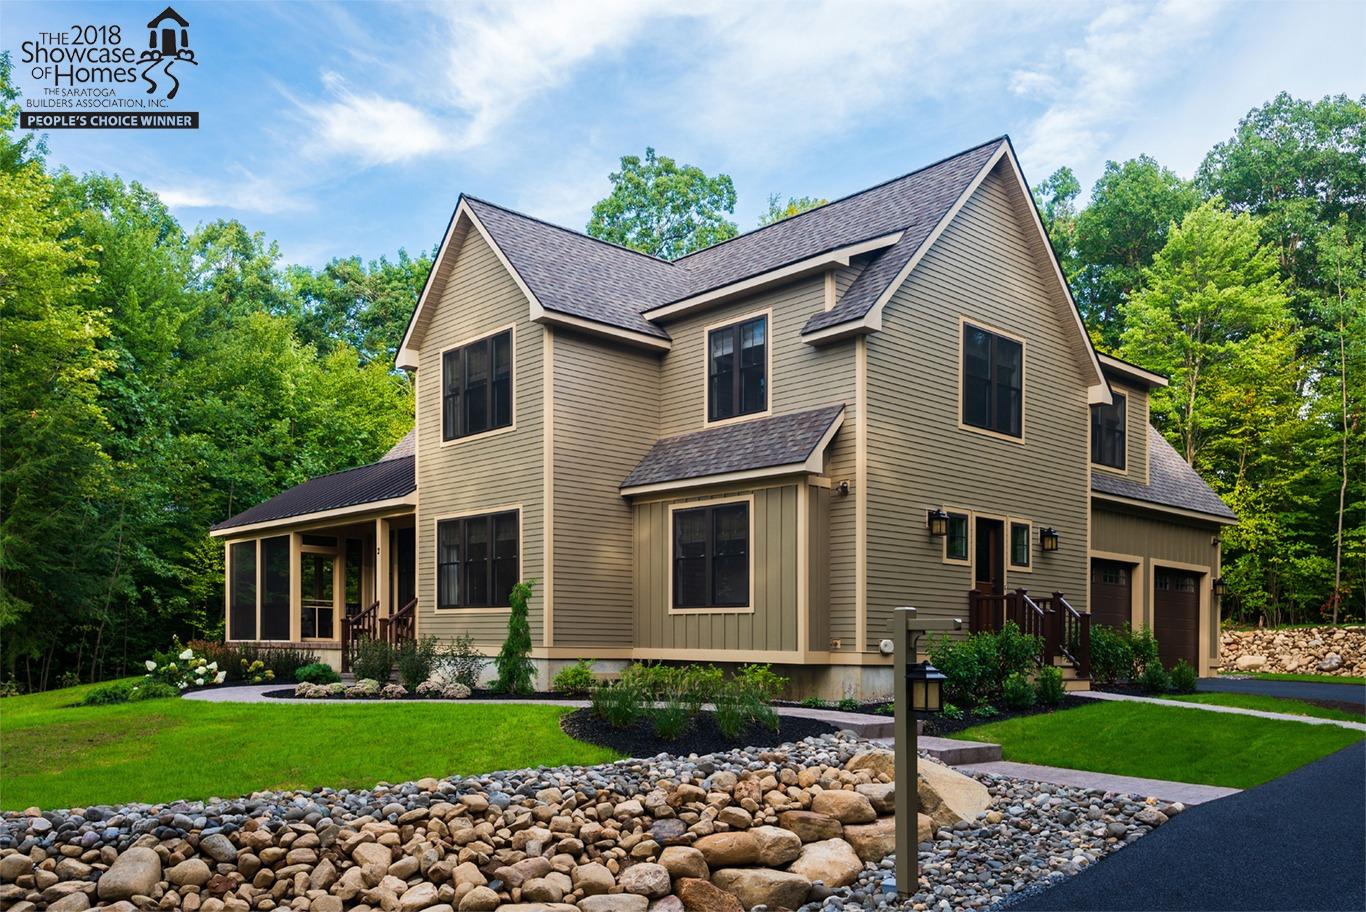 Kodiak Construction's award-winning entry in the 2018 Saratoga Showcase of Homes